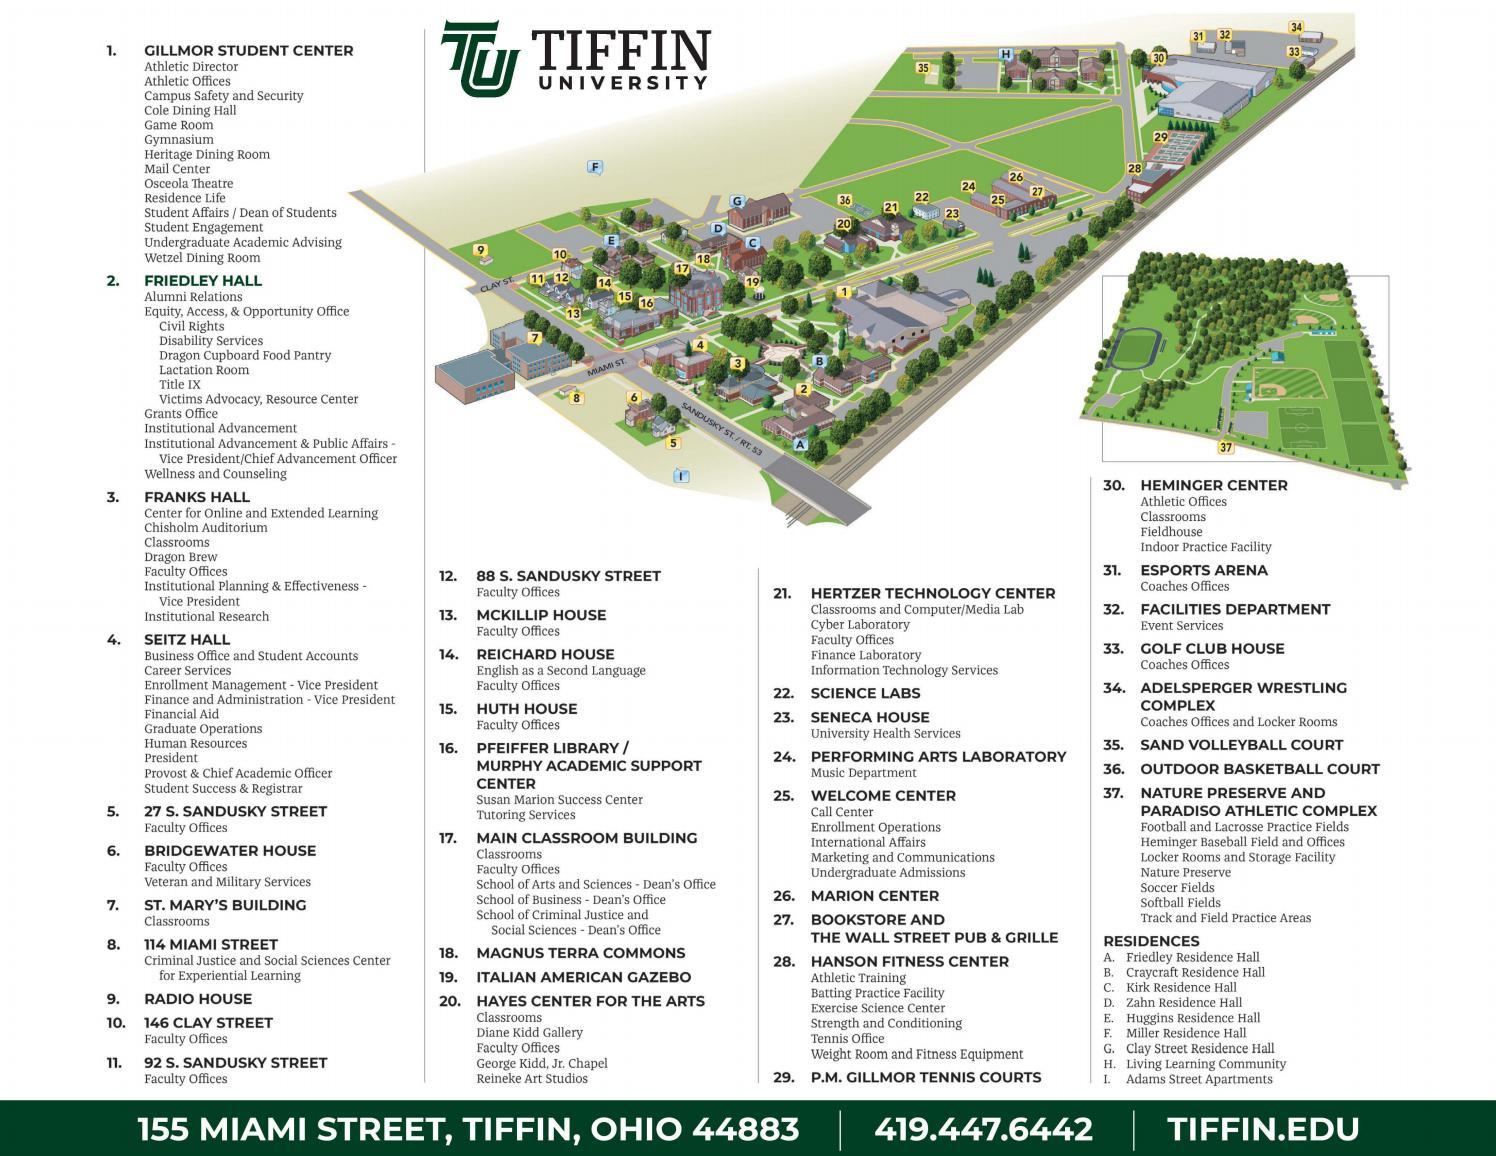 pfeiffer university campus map Tiffin University Campus Map 2019 By Tiffin University Issuu pfeiffer university campus map